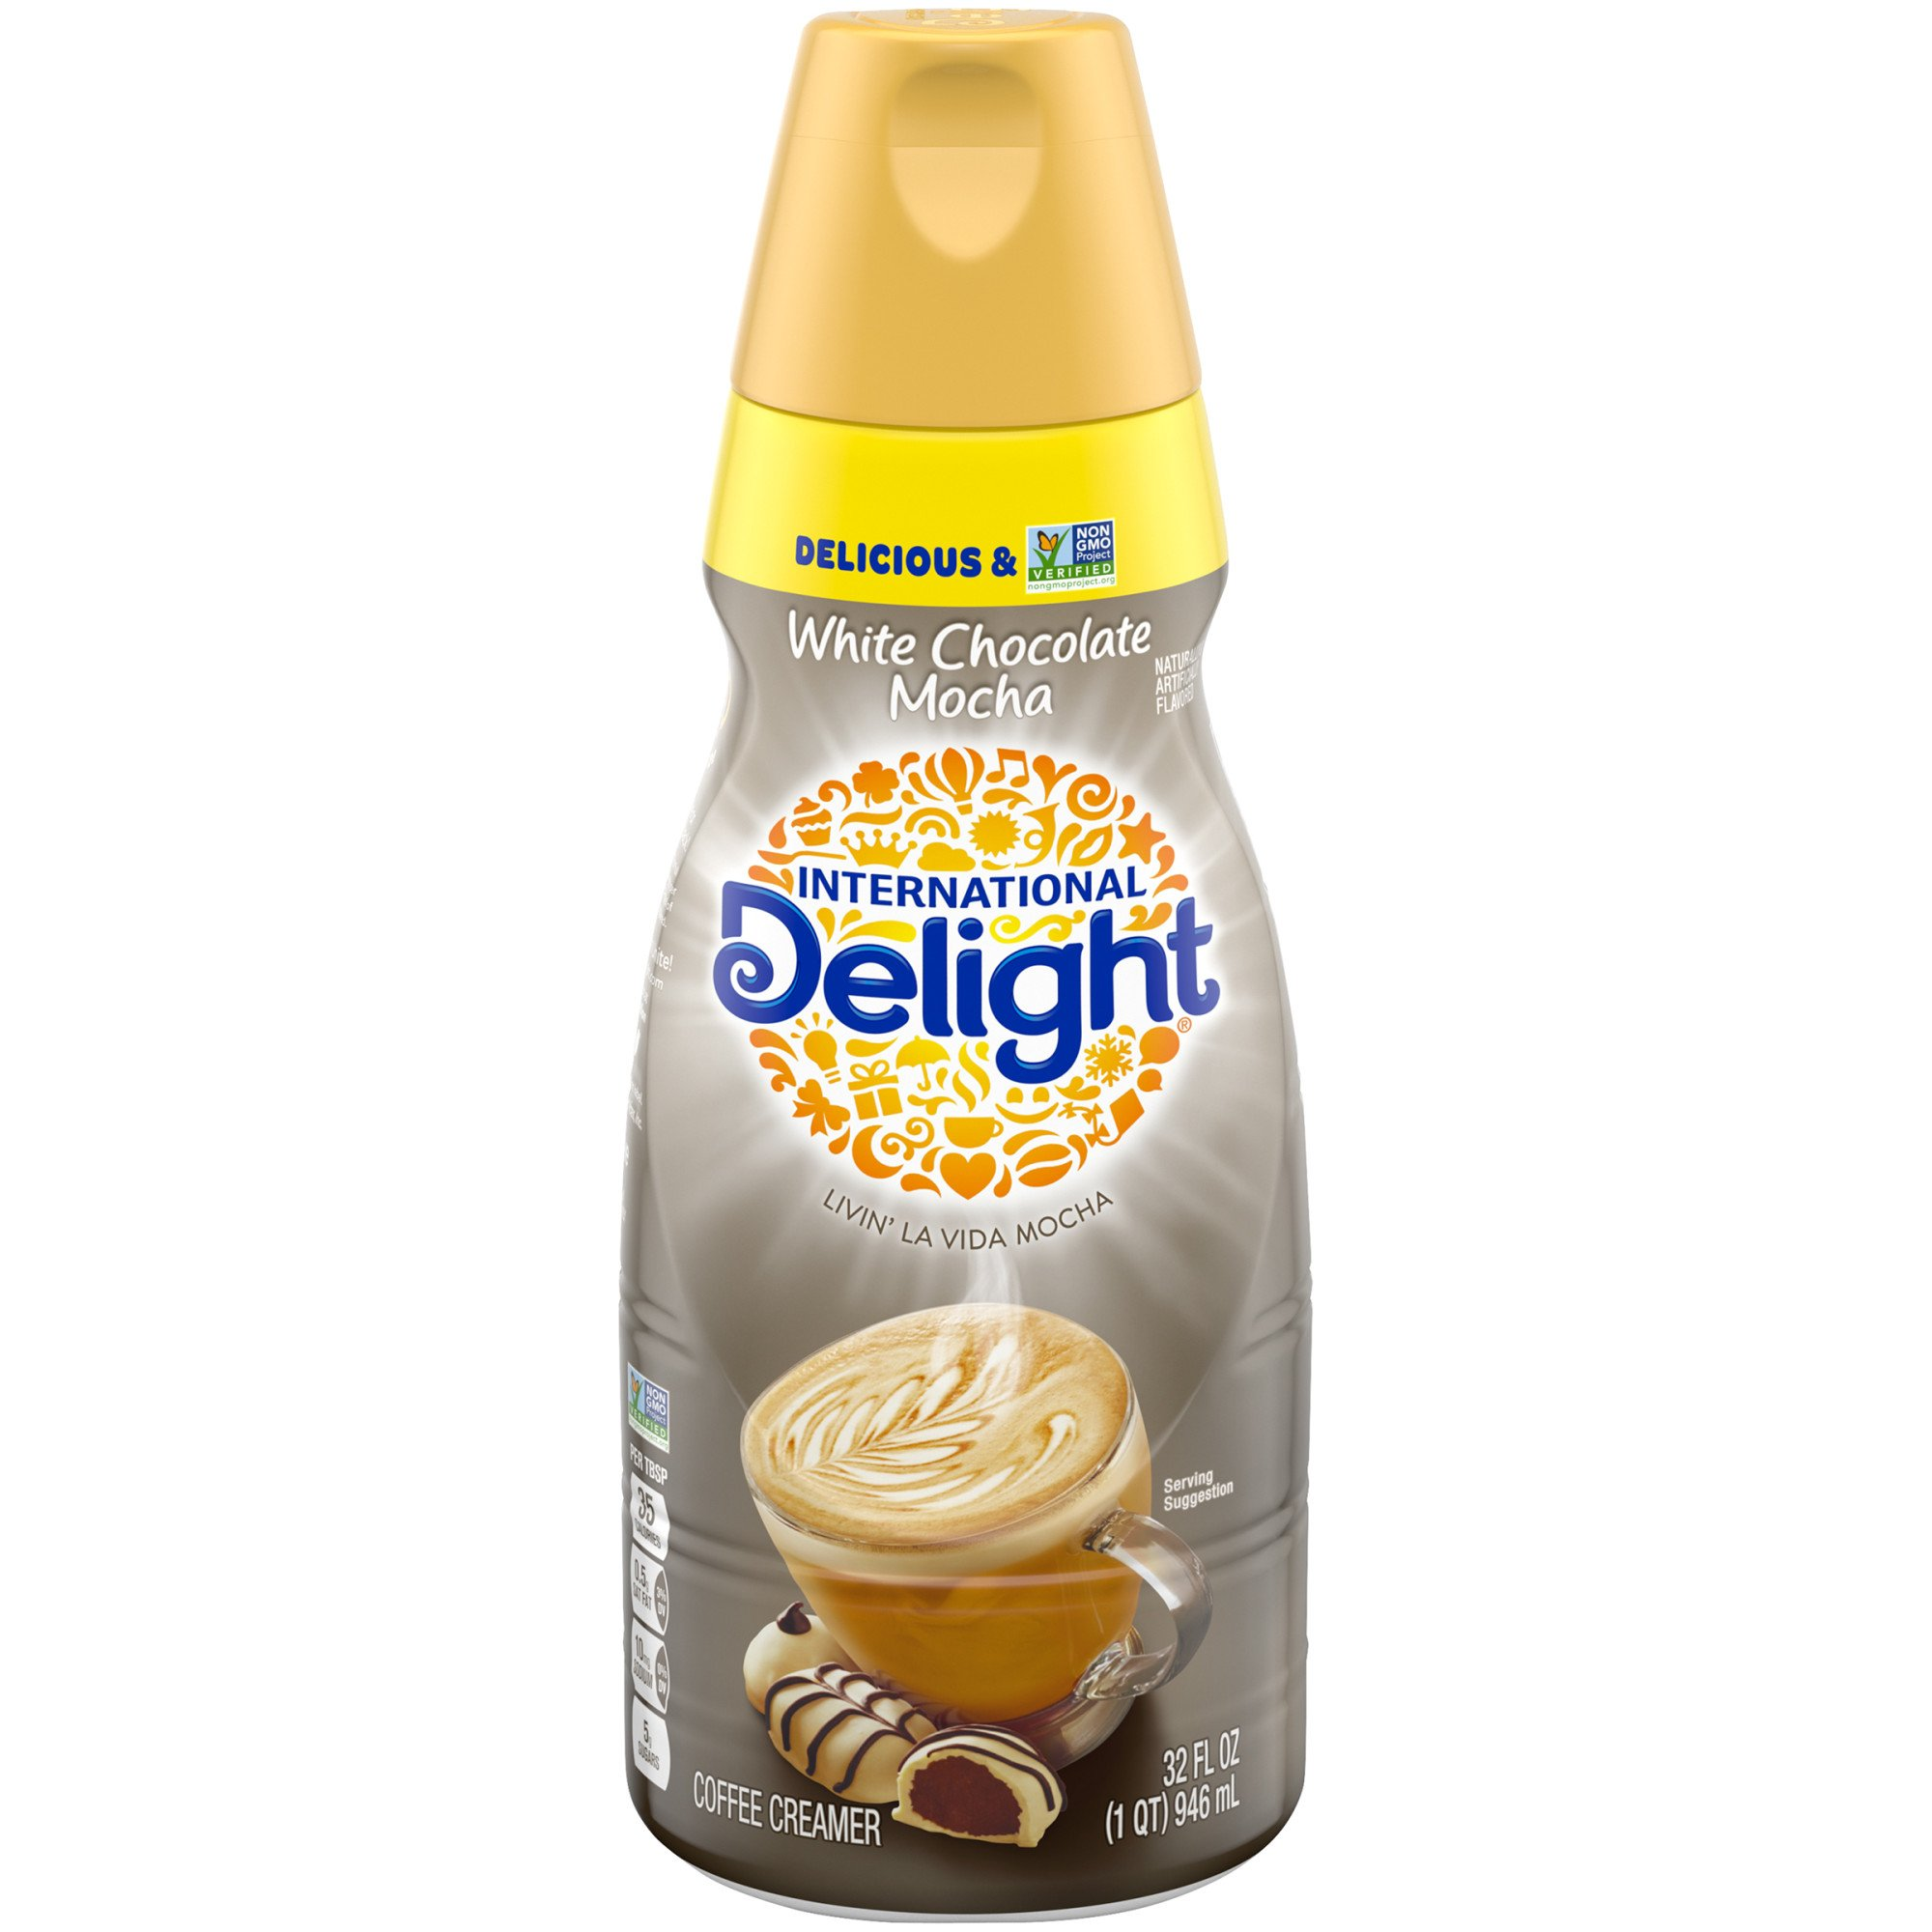 International Delight White Chocolate Mocha Liquid Coffee